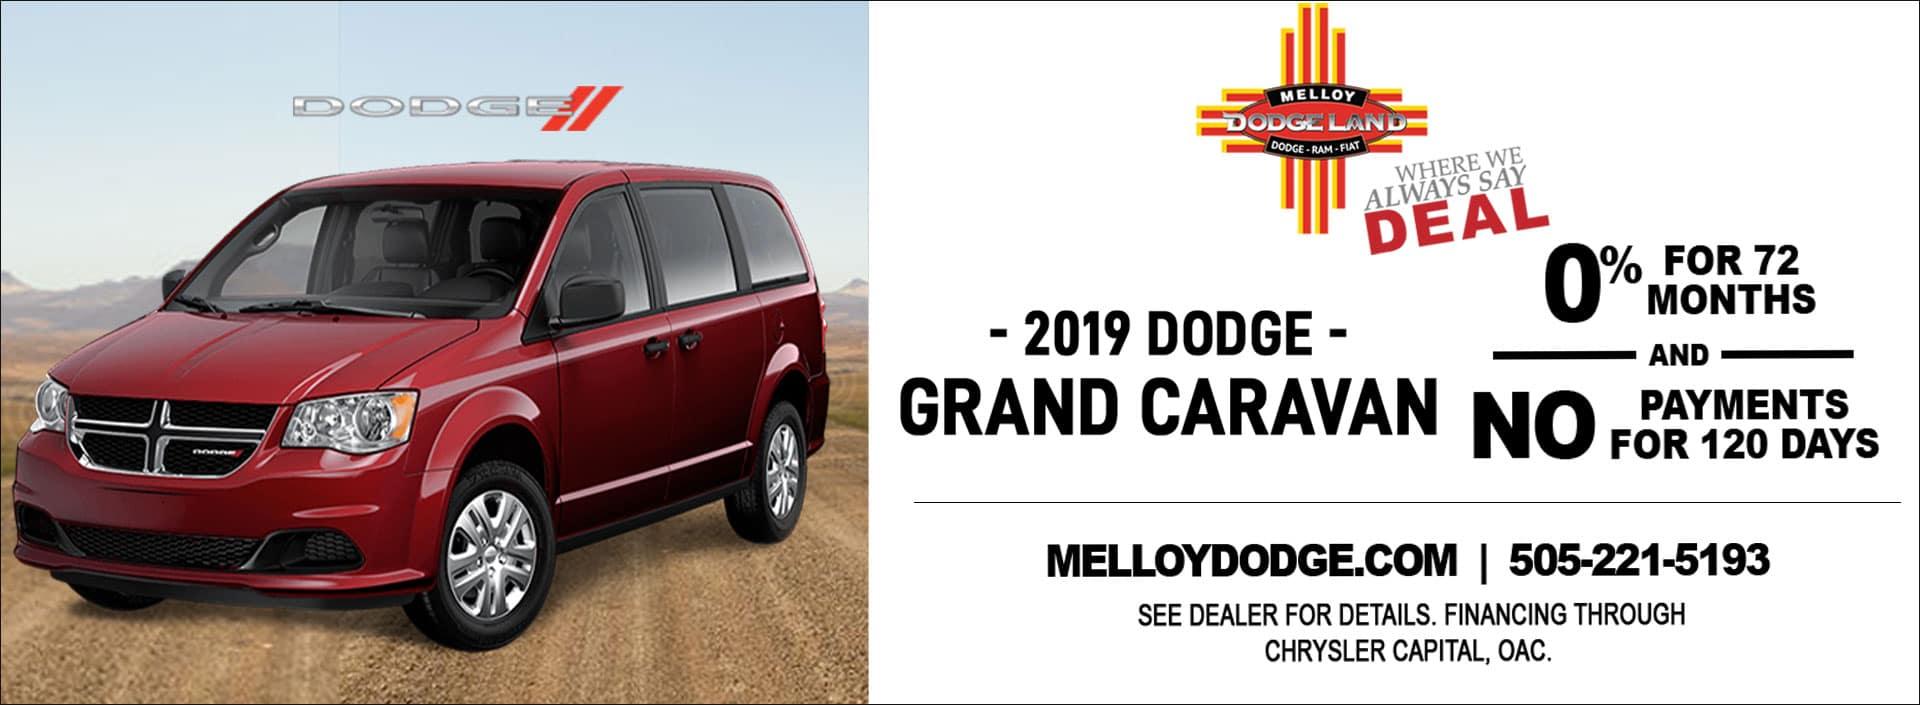 image showing grand caravan promo